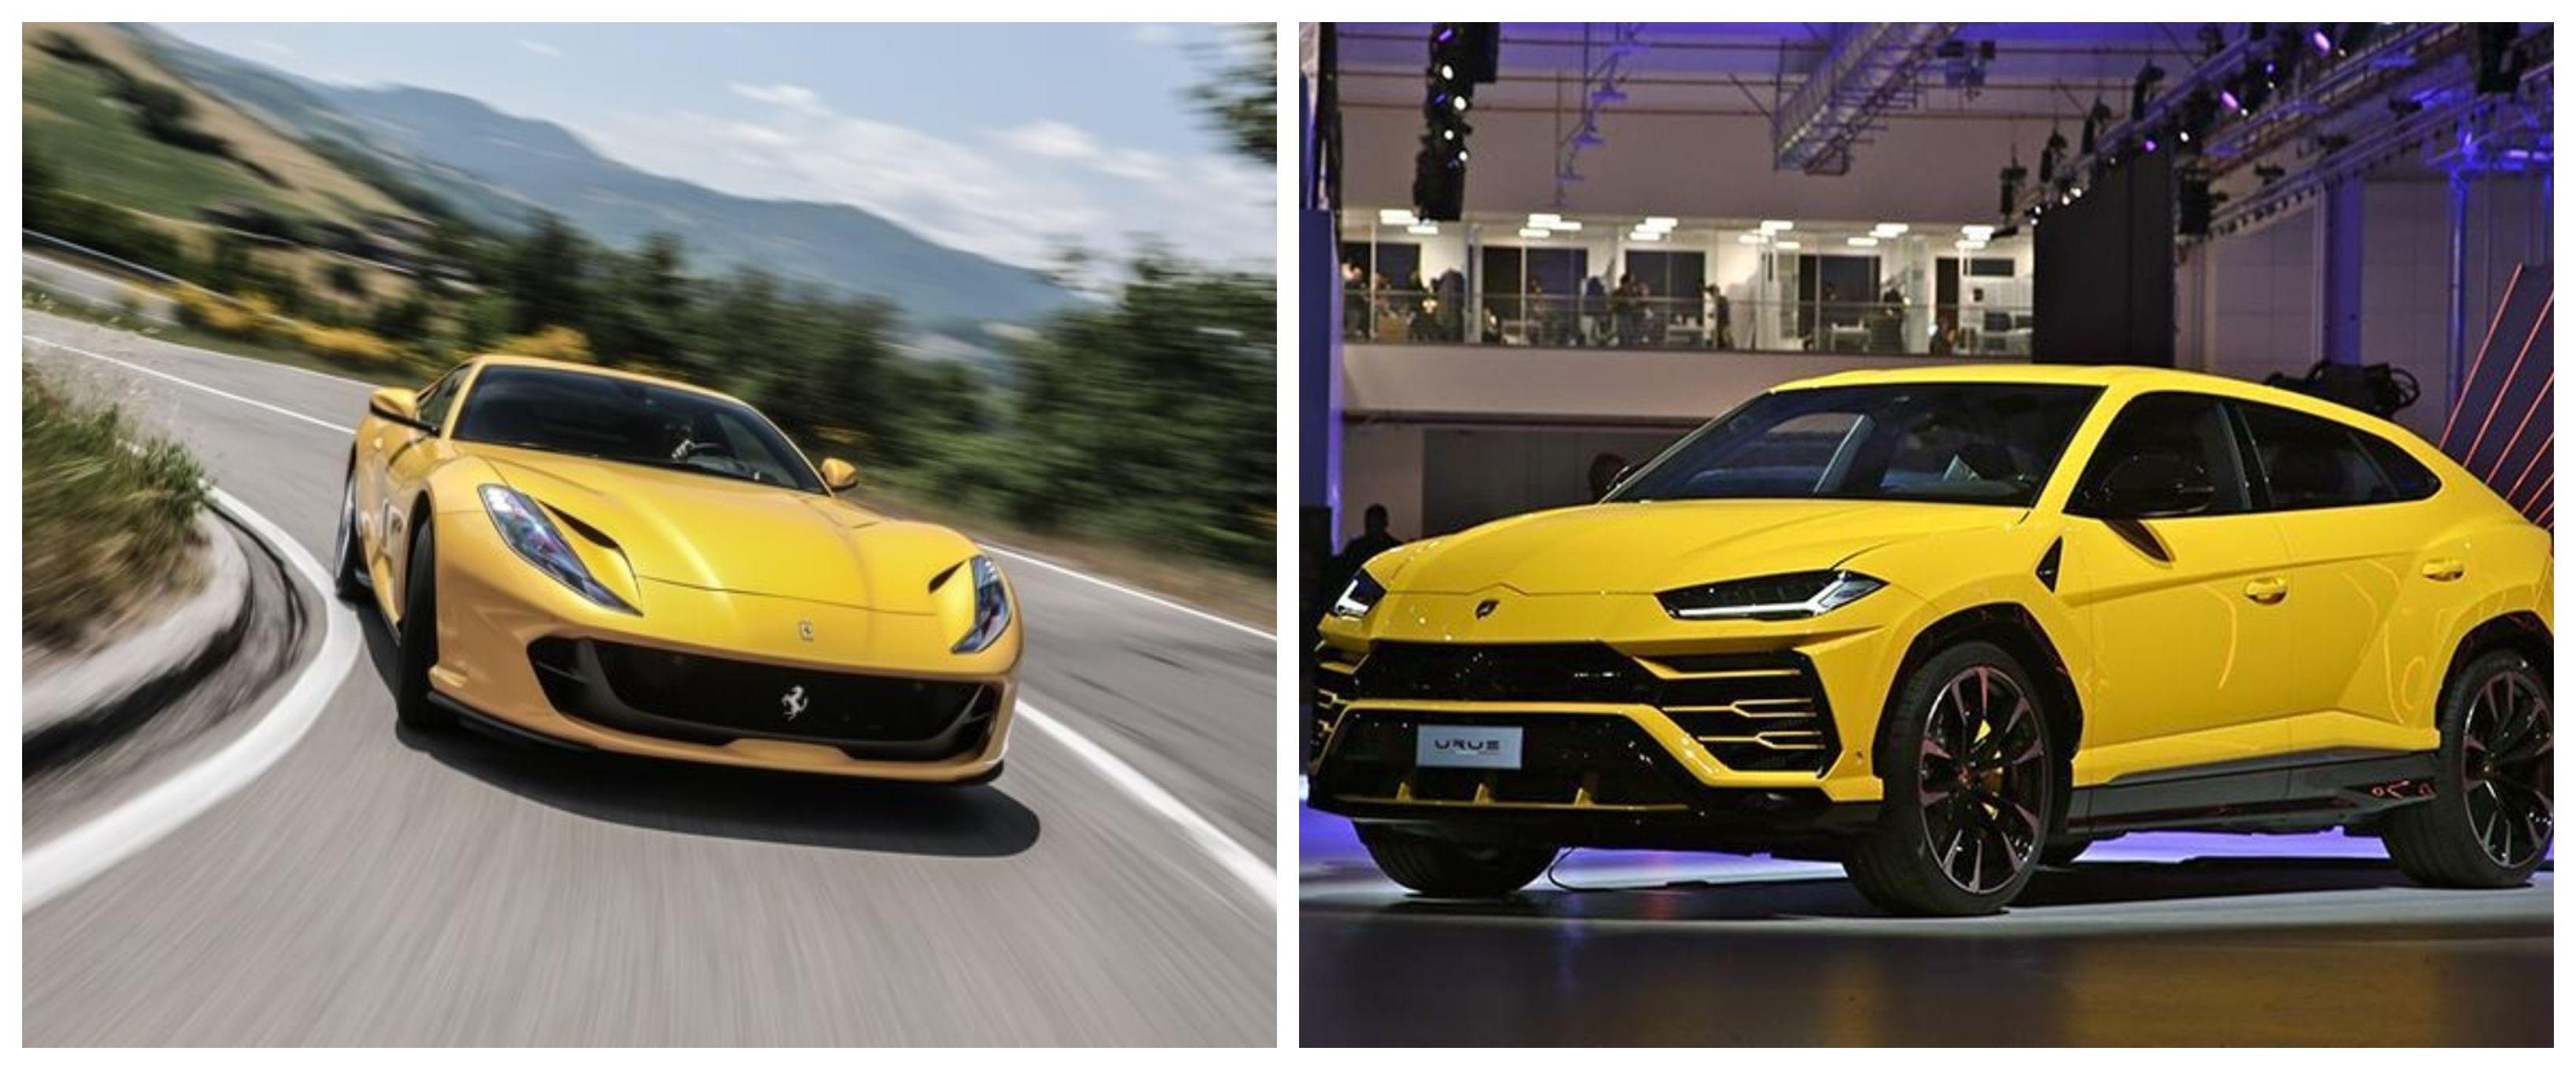 Ferrari Or Lamborghini Sardinia Luxury Car Hire Luxury Car Rental Luxury Cars